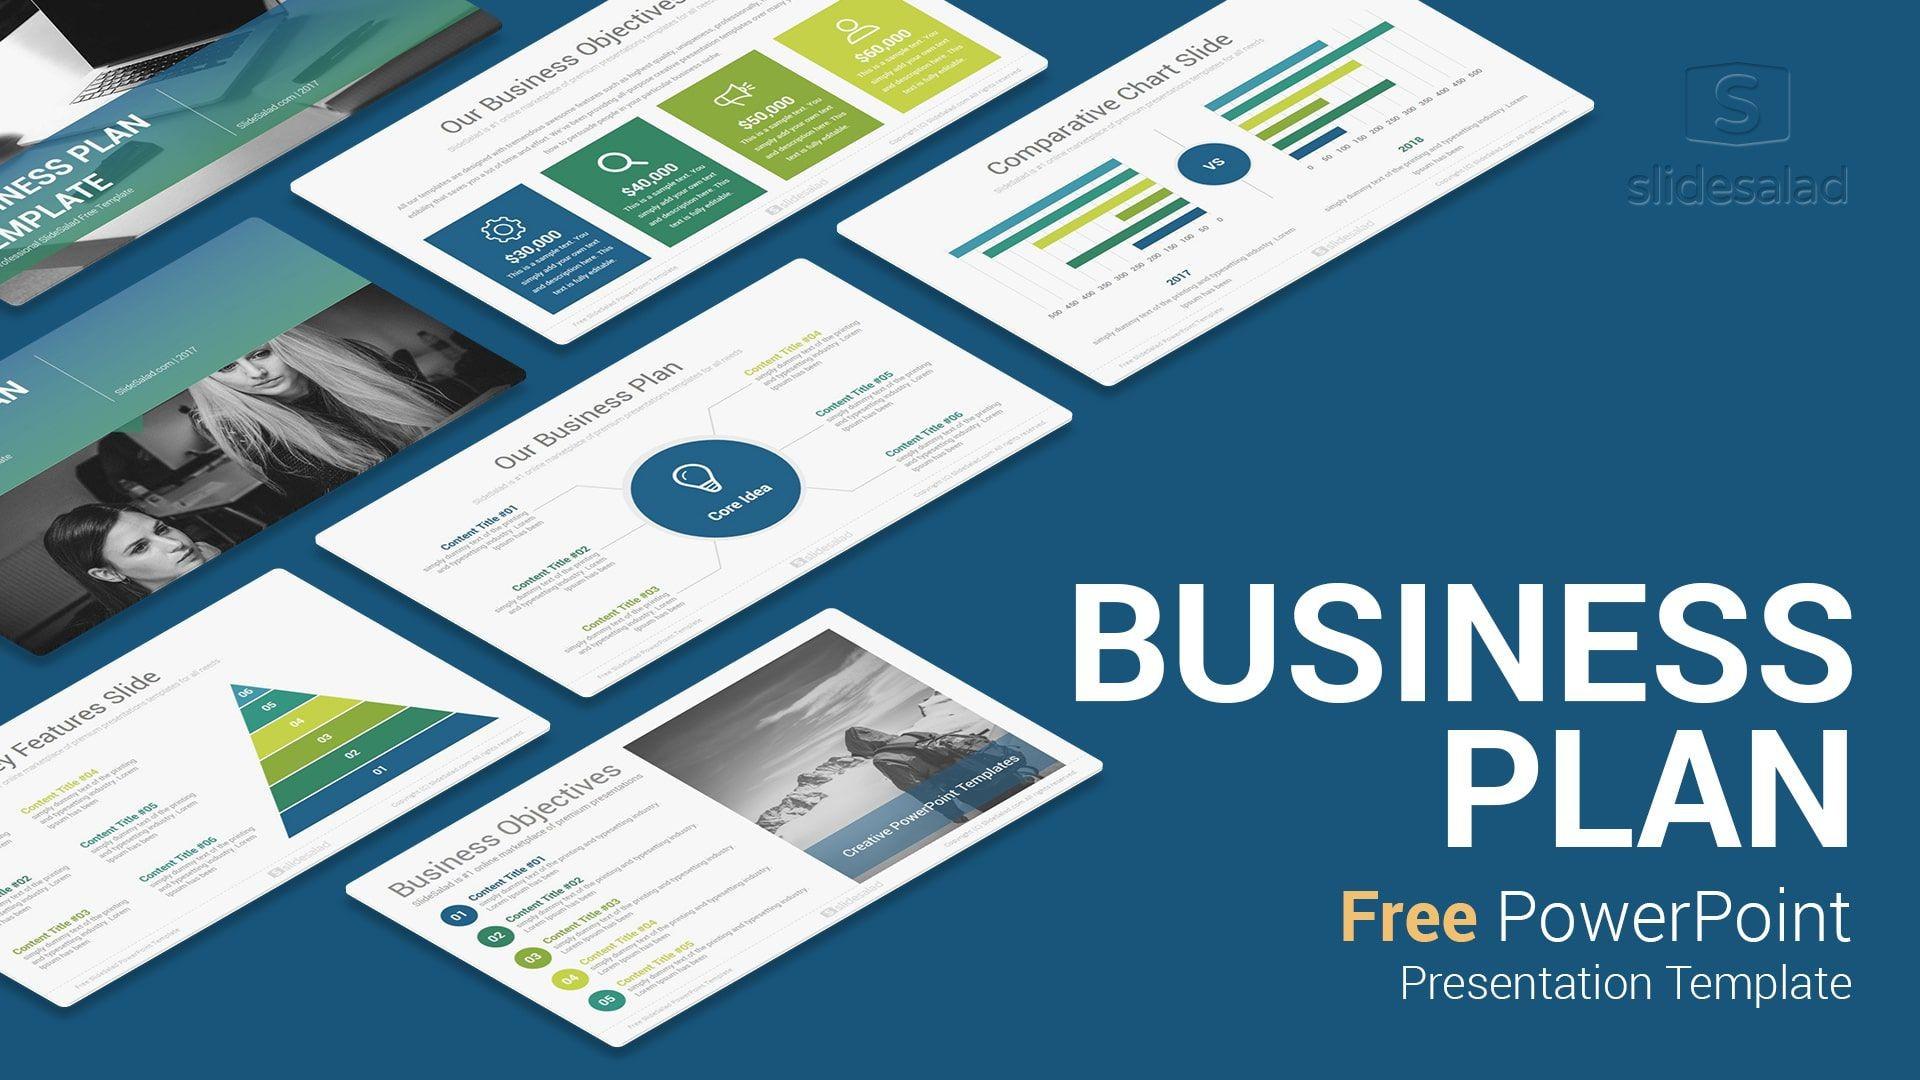 006 Unique Free Busines Proposal Template Powerpoint High Definition  Best Plan Ppt 2020 Sale1920